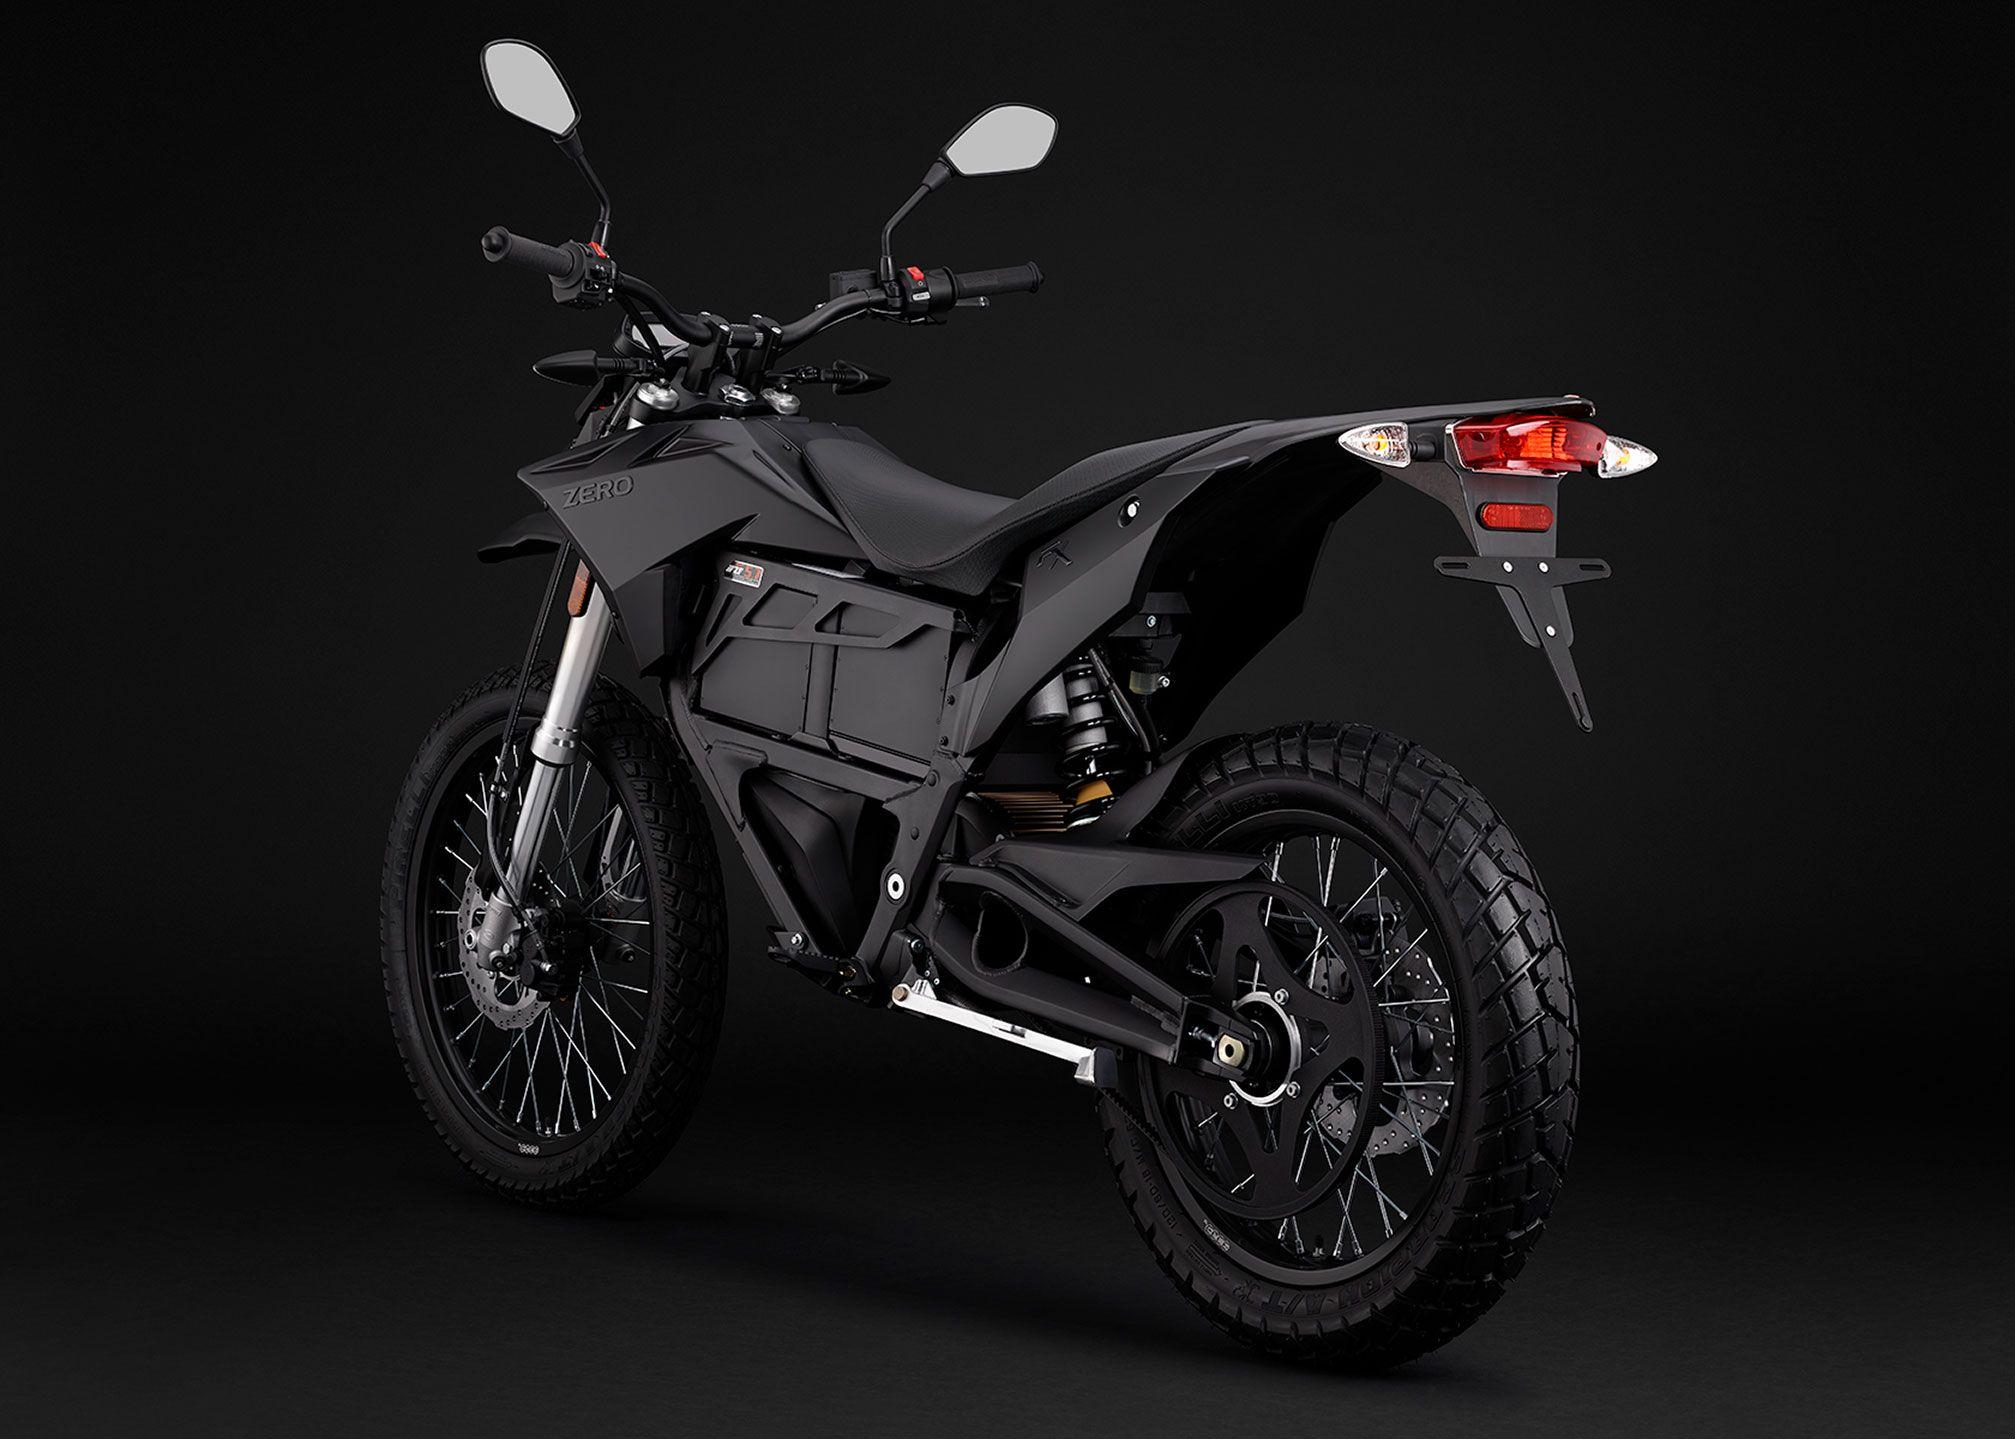 2015 Zero Fx5 Jpg 2015 1439 Motorcycle Electric Motorcycle